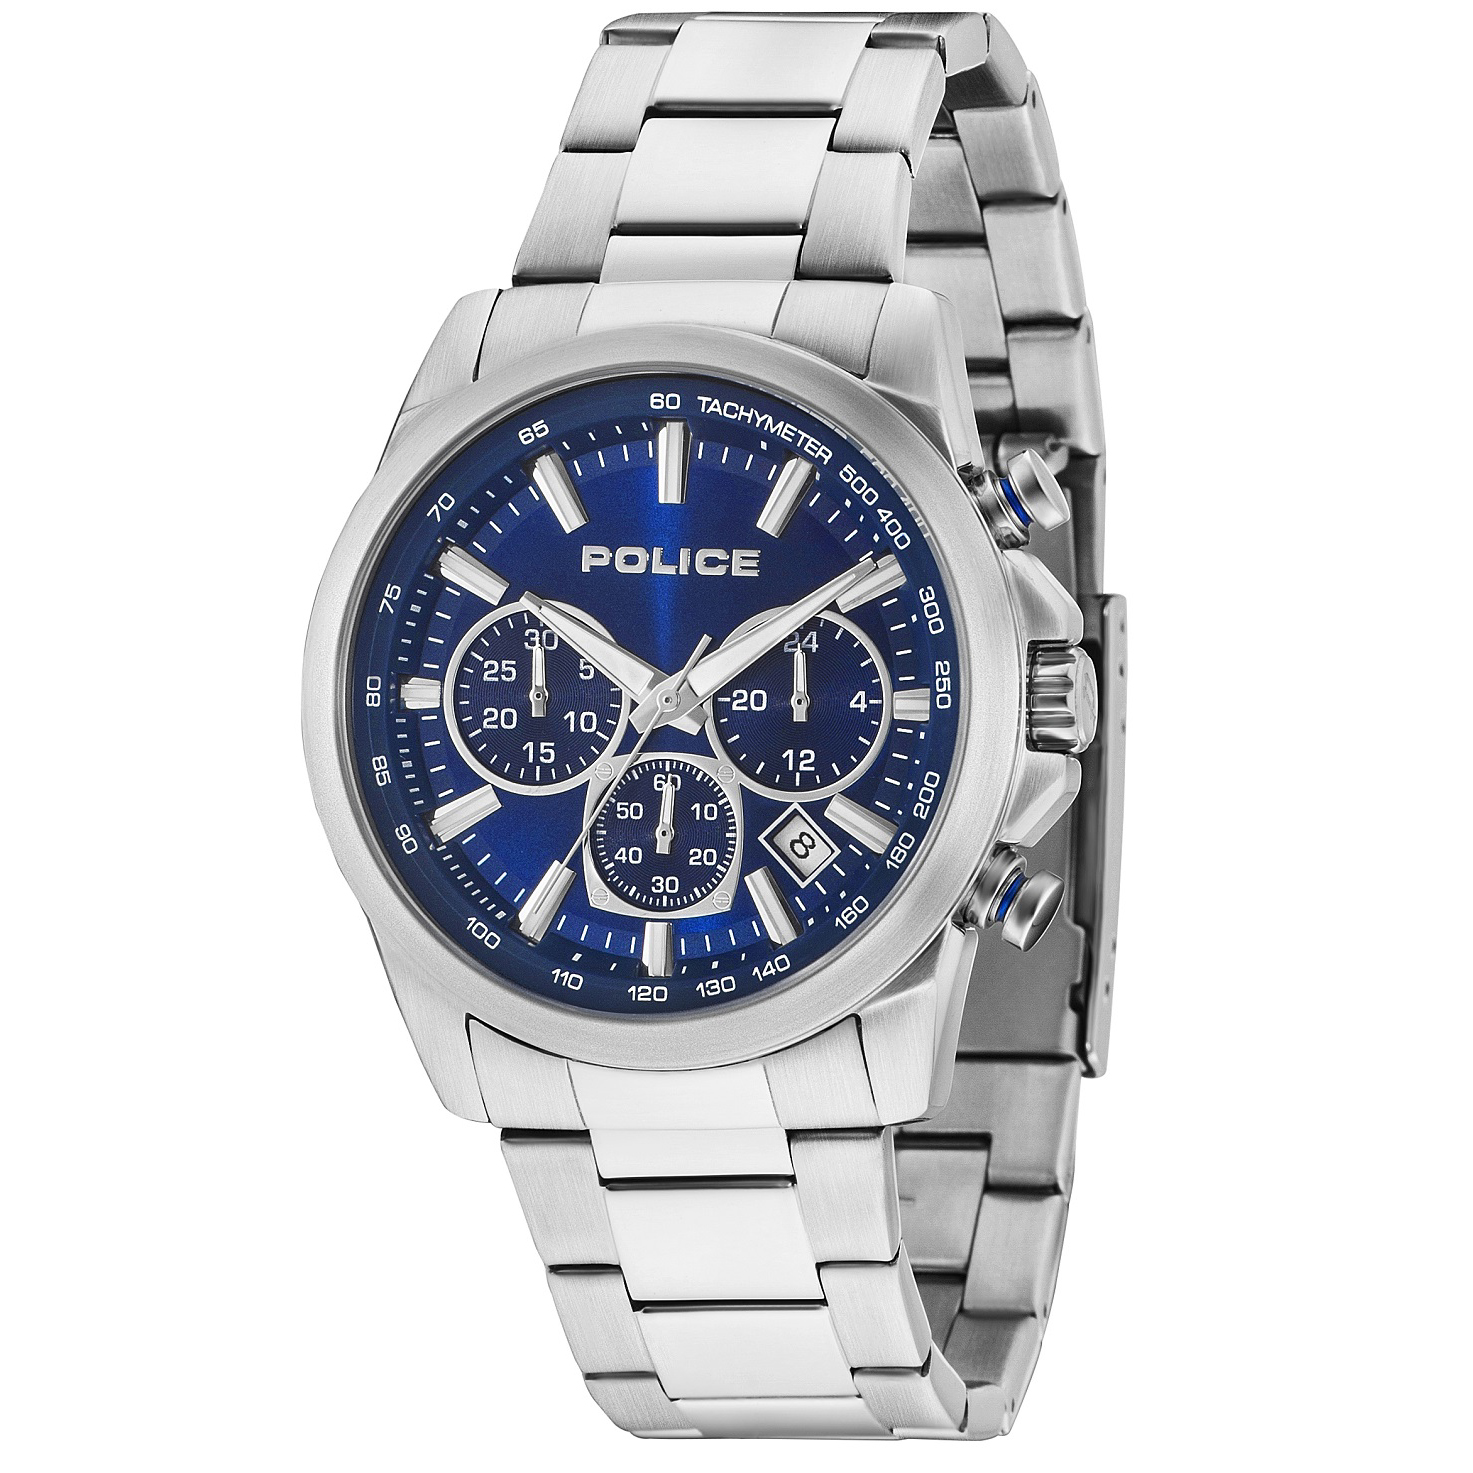 POLICE(ポリス)腕時計GRAMERCY グラマシー ブルー【14964JS-03M】